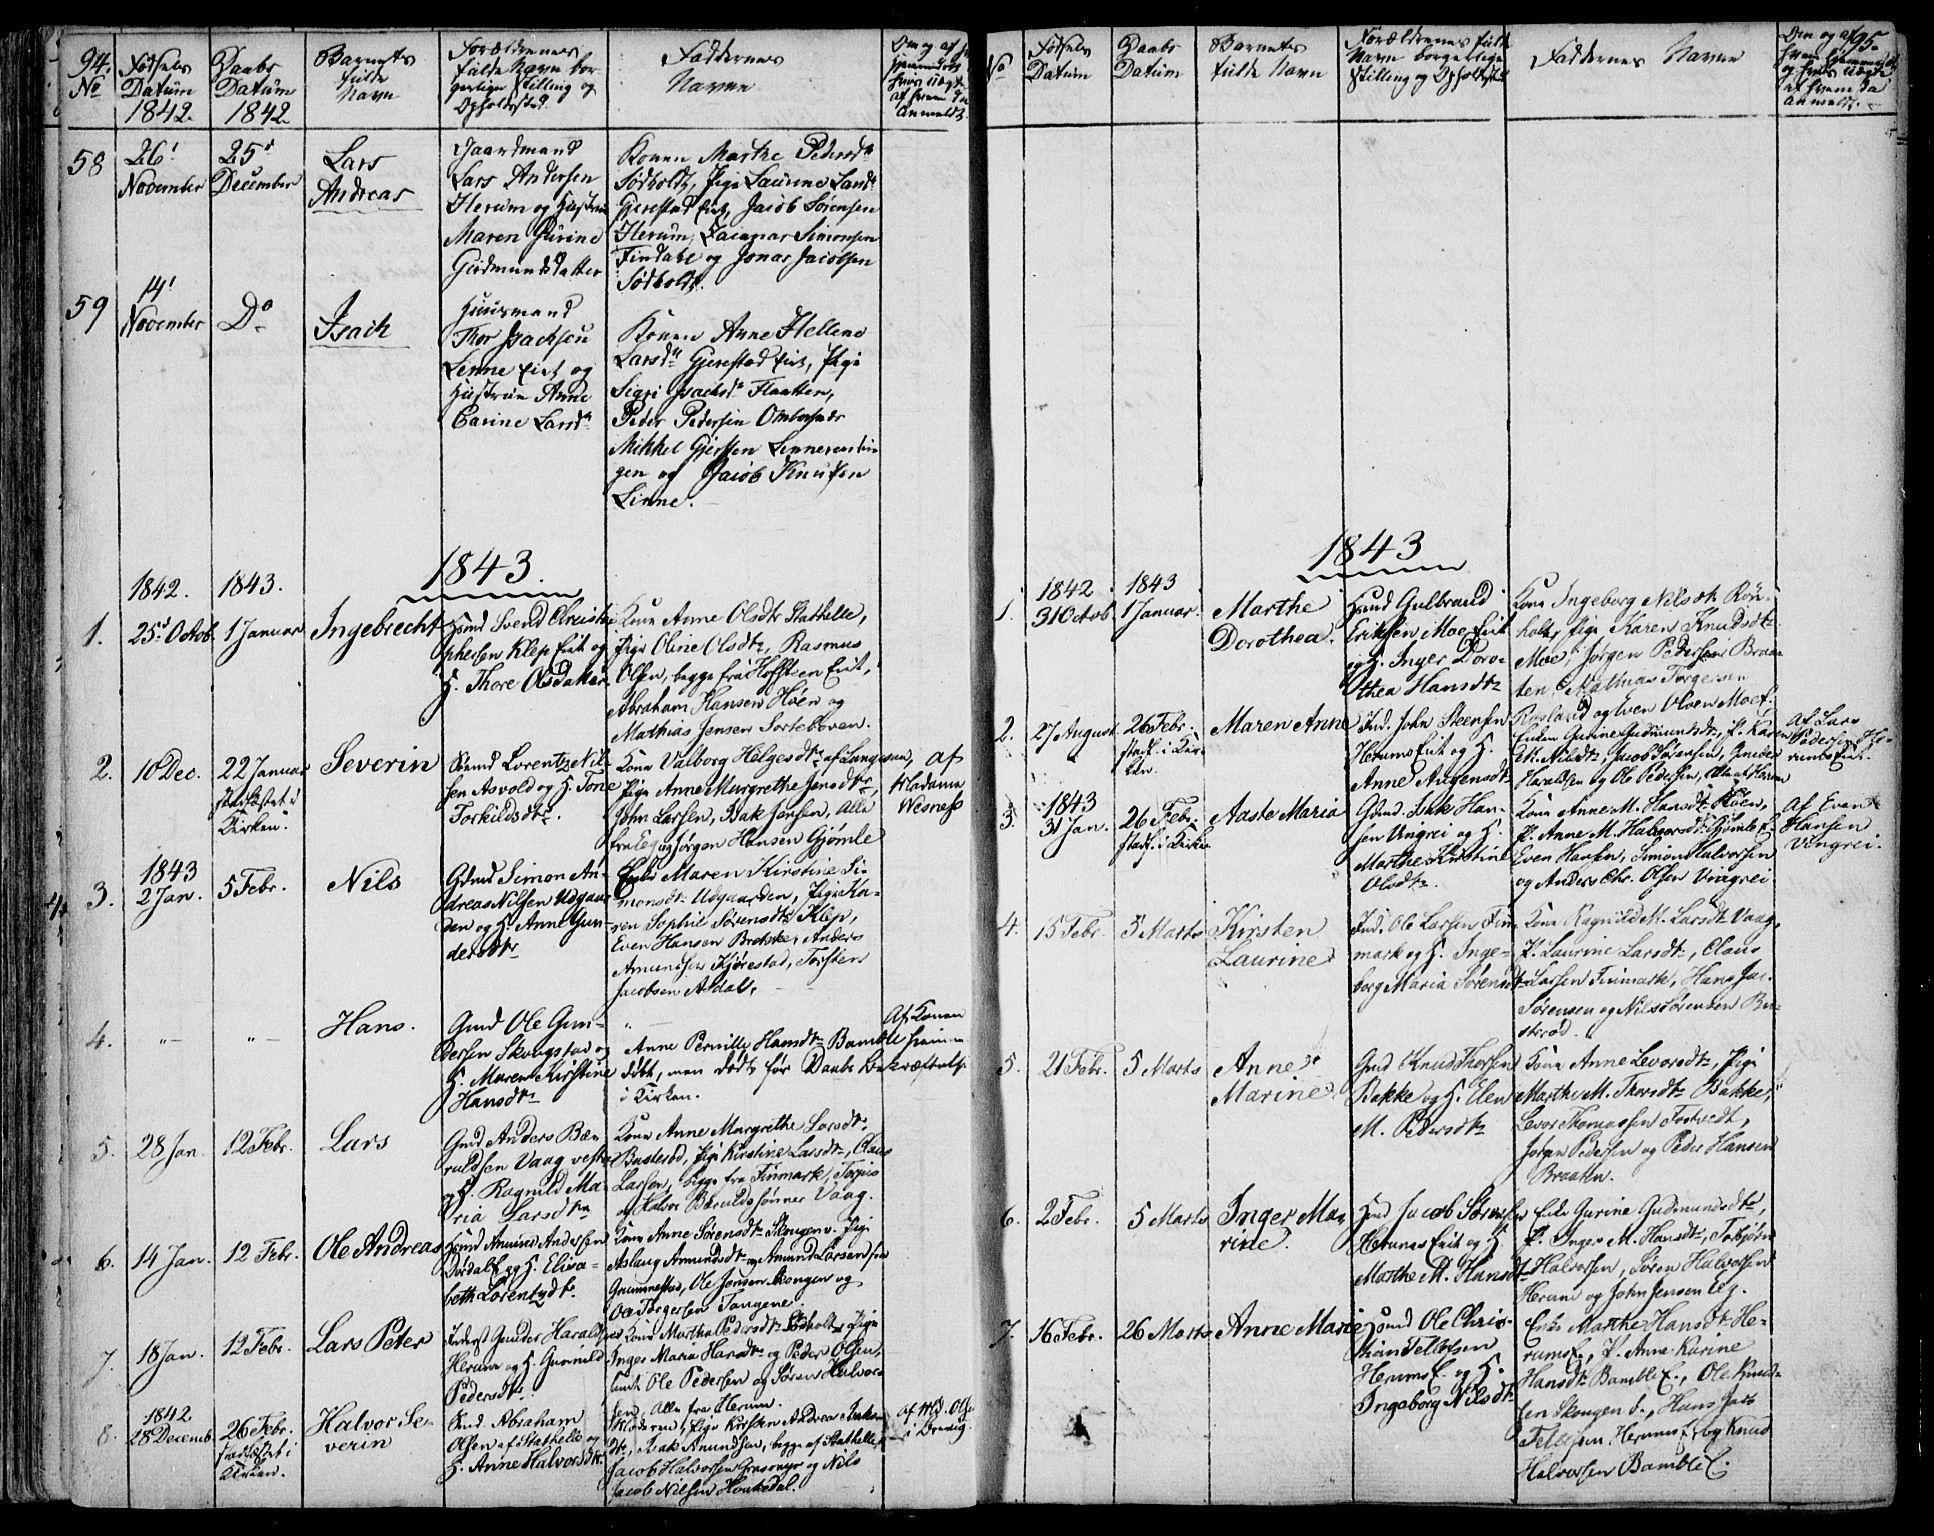 SAKO, Bamble kirkebøker, F/Fa/L0004: Ministerialbok nr. I 4, 1834-1853, s. 94-95